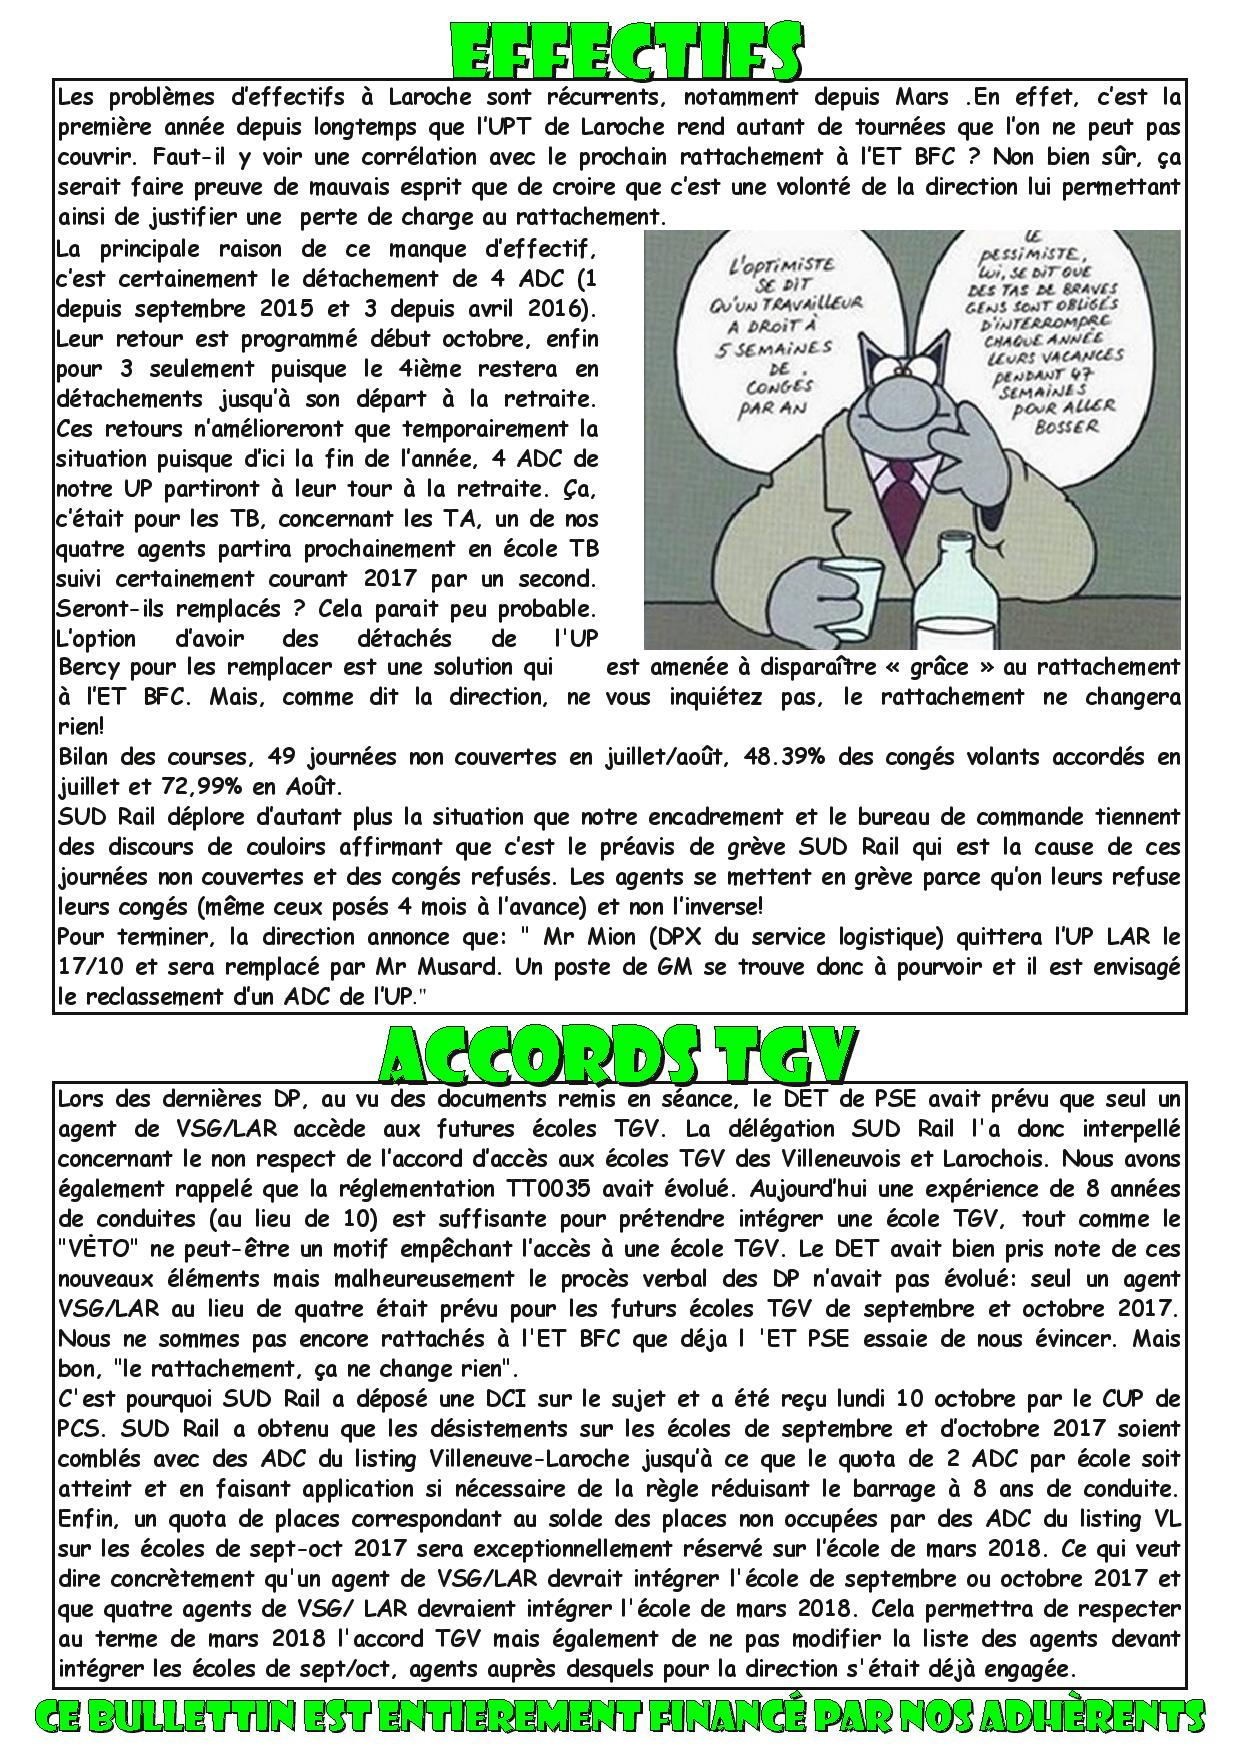 crdp-upt-lar-09-2016-page-005